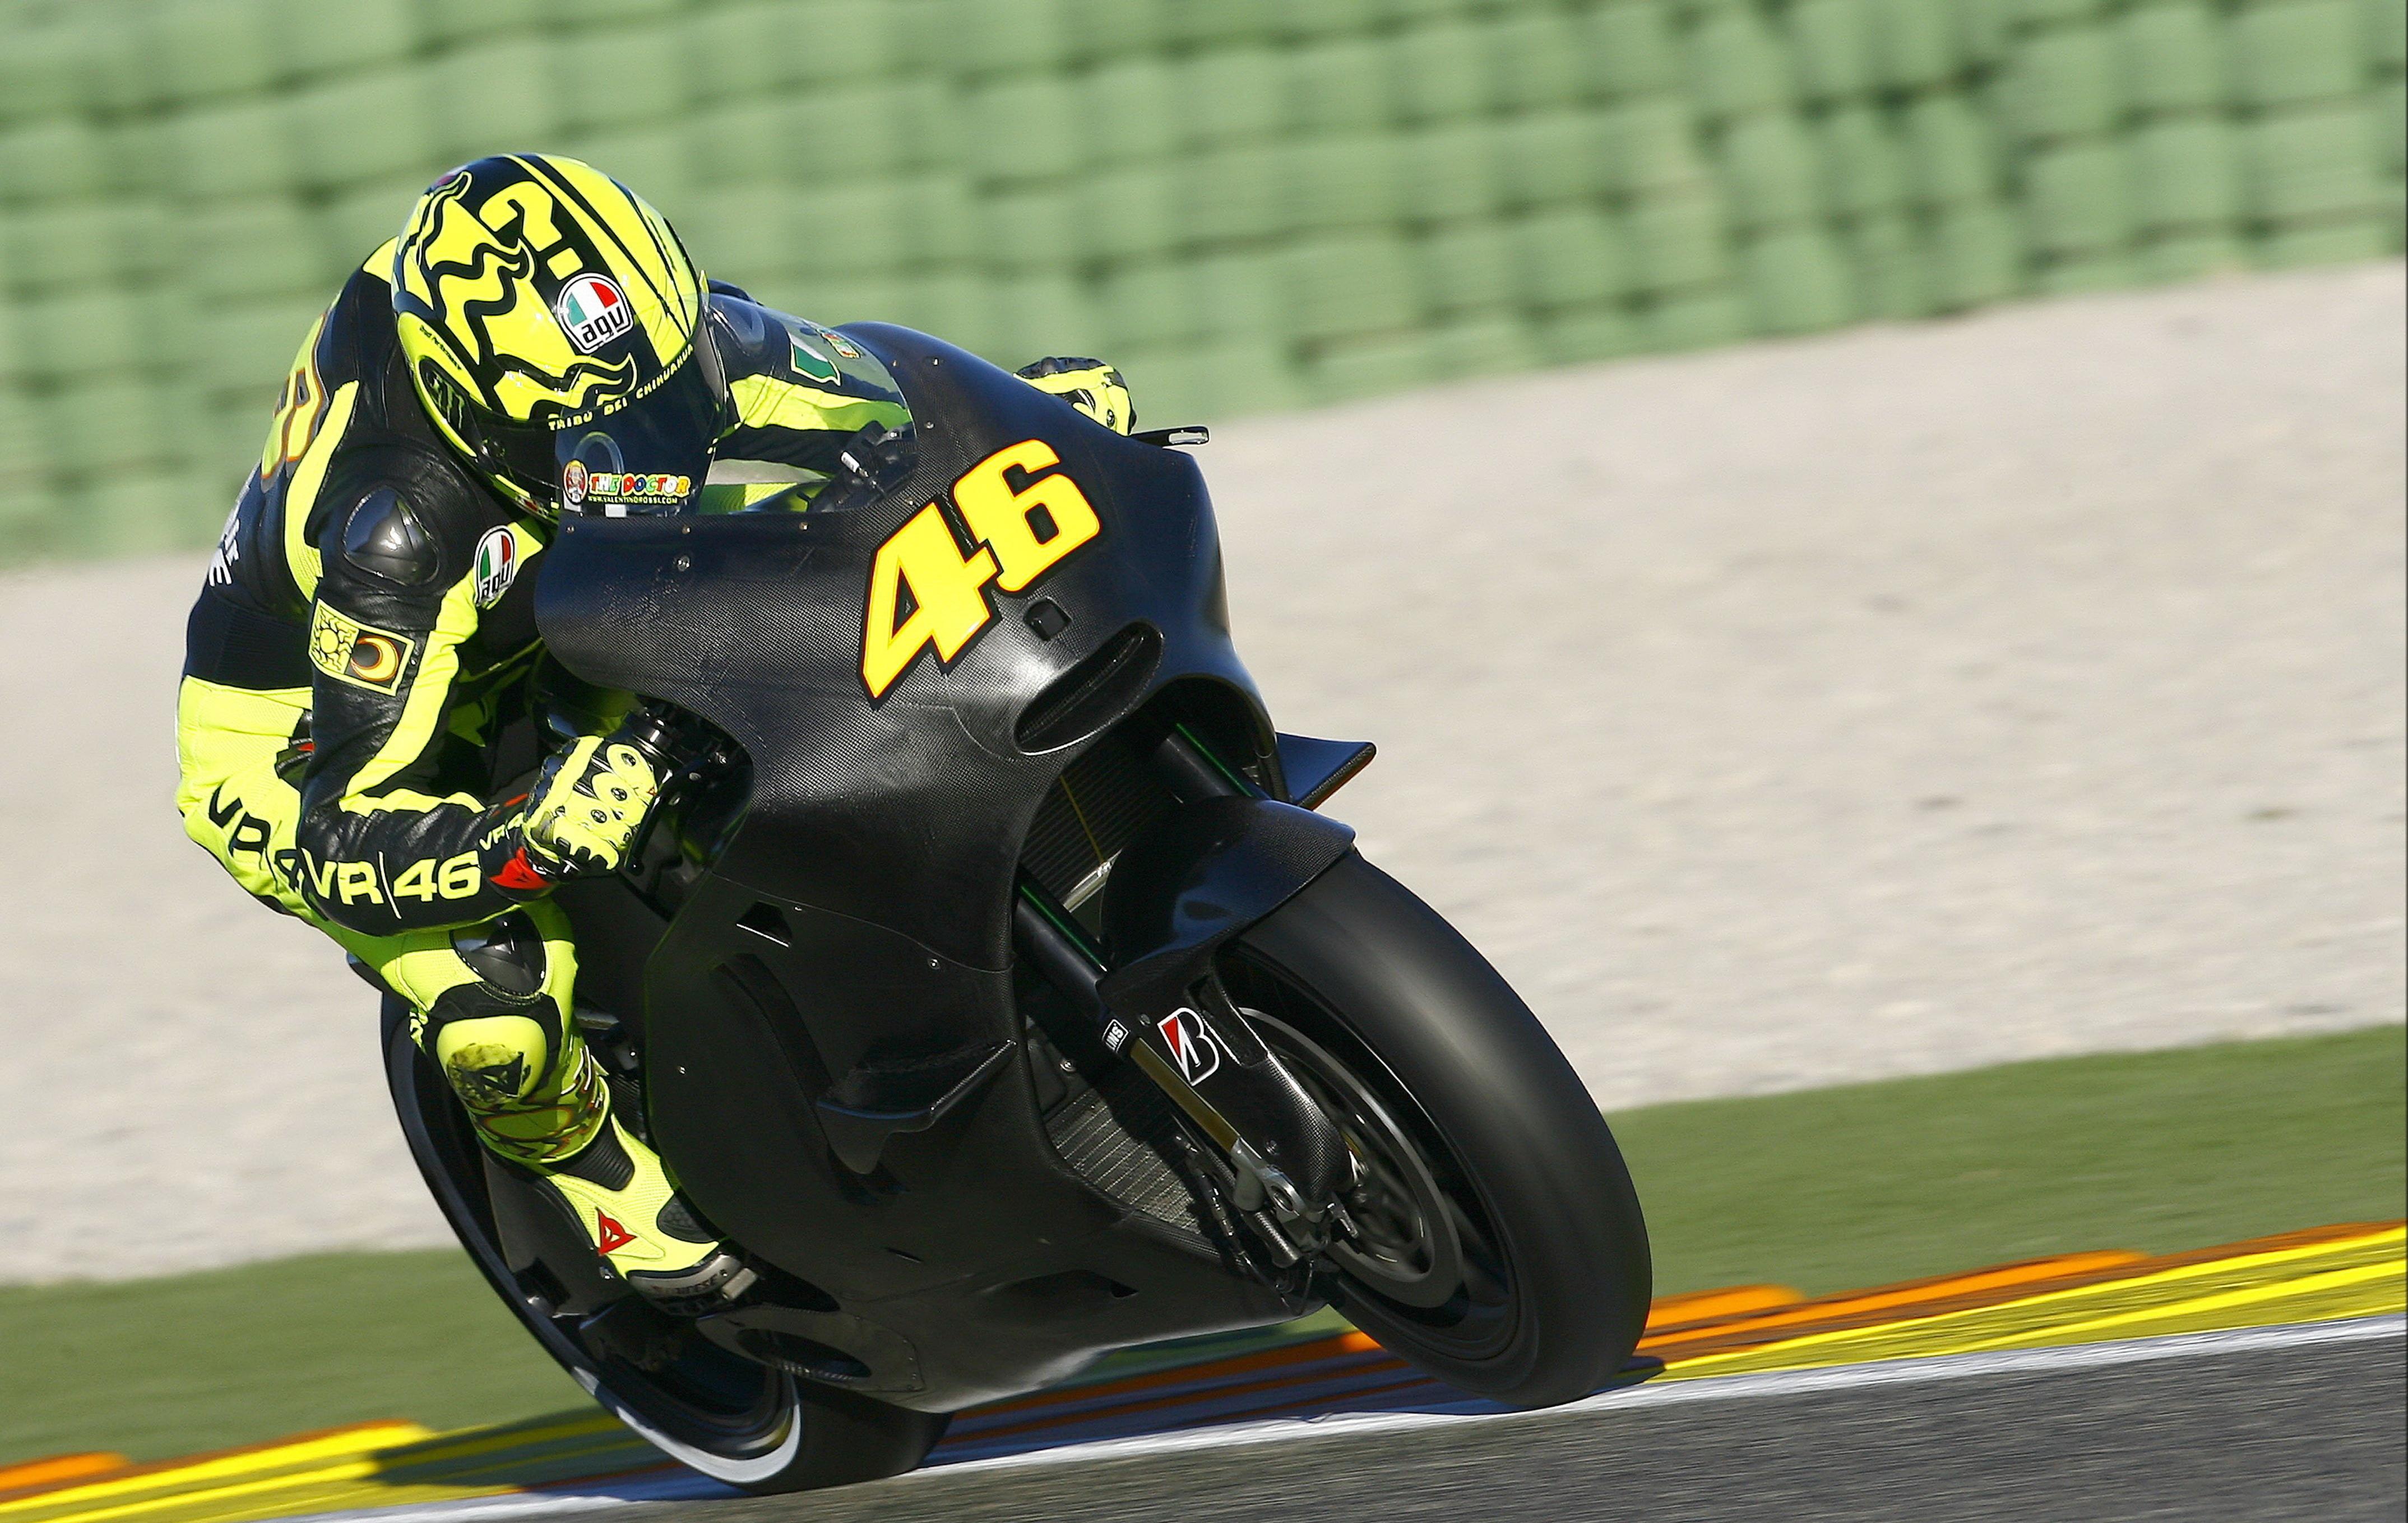 Motorcycle Racing 4k Ultra HD Wallpaper | Background Image ...